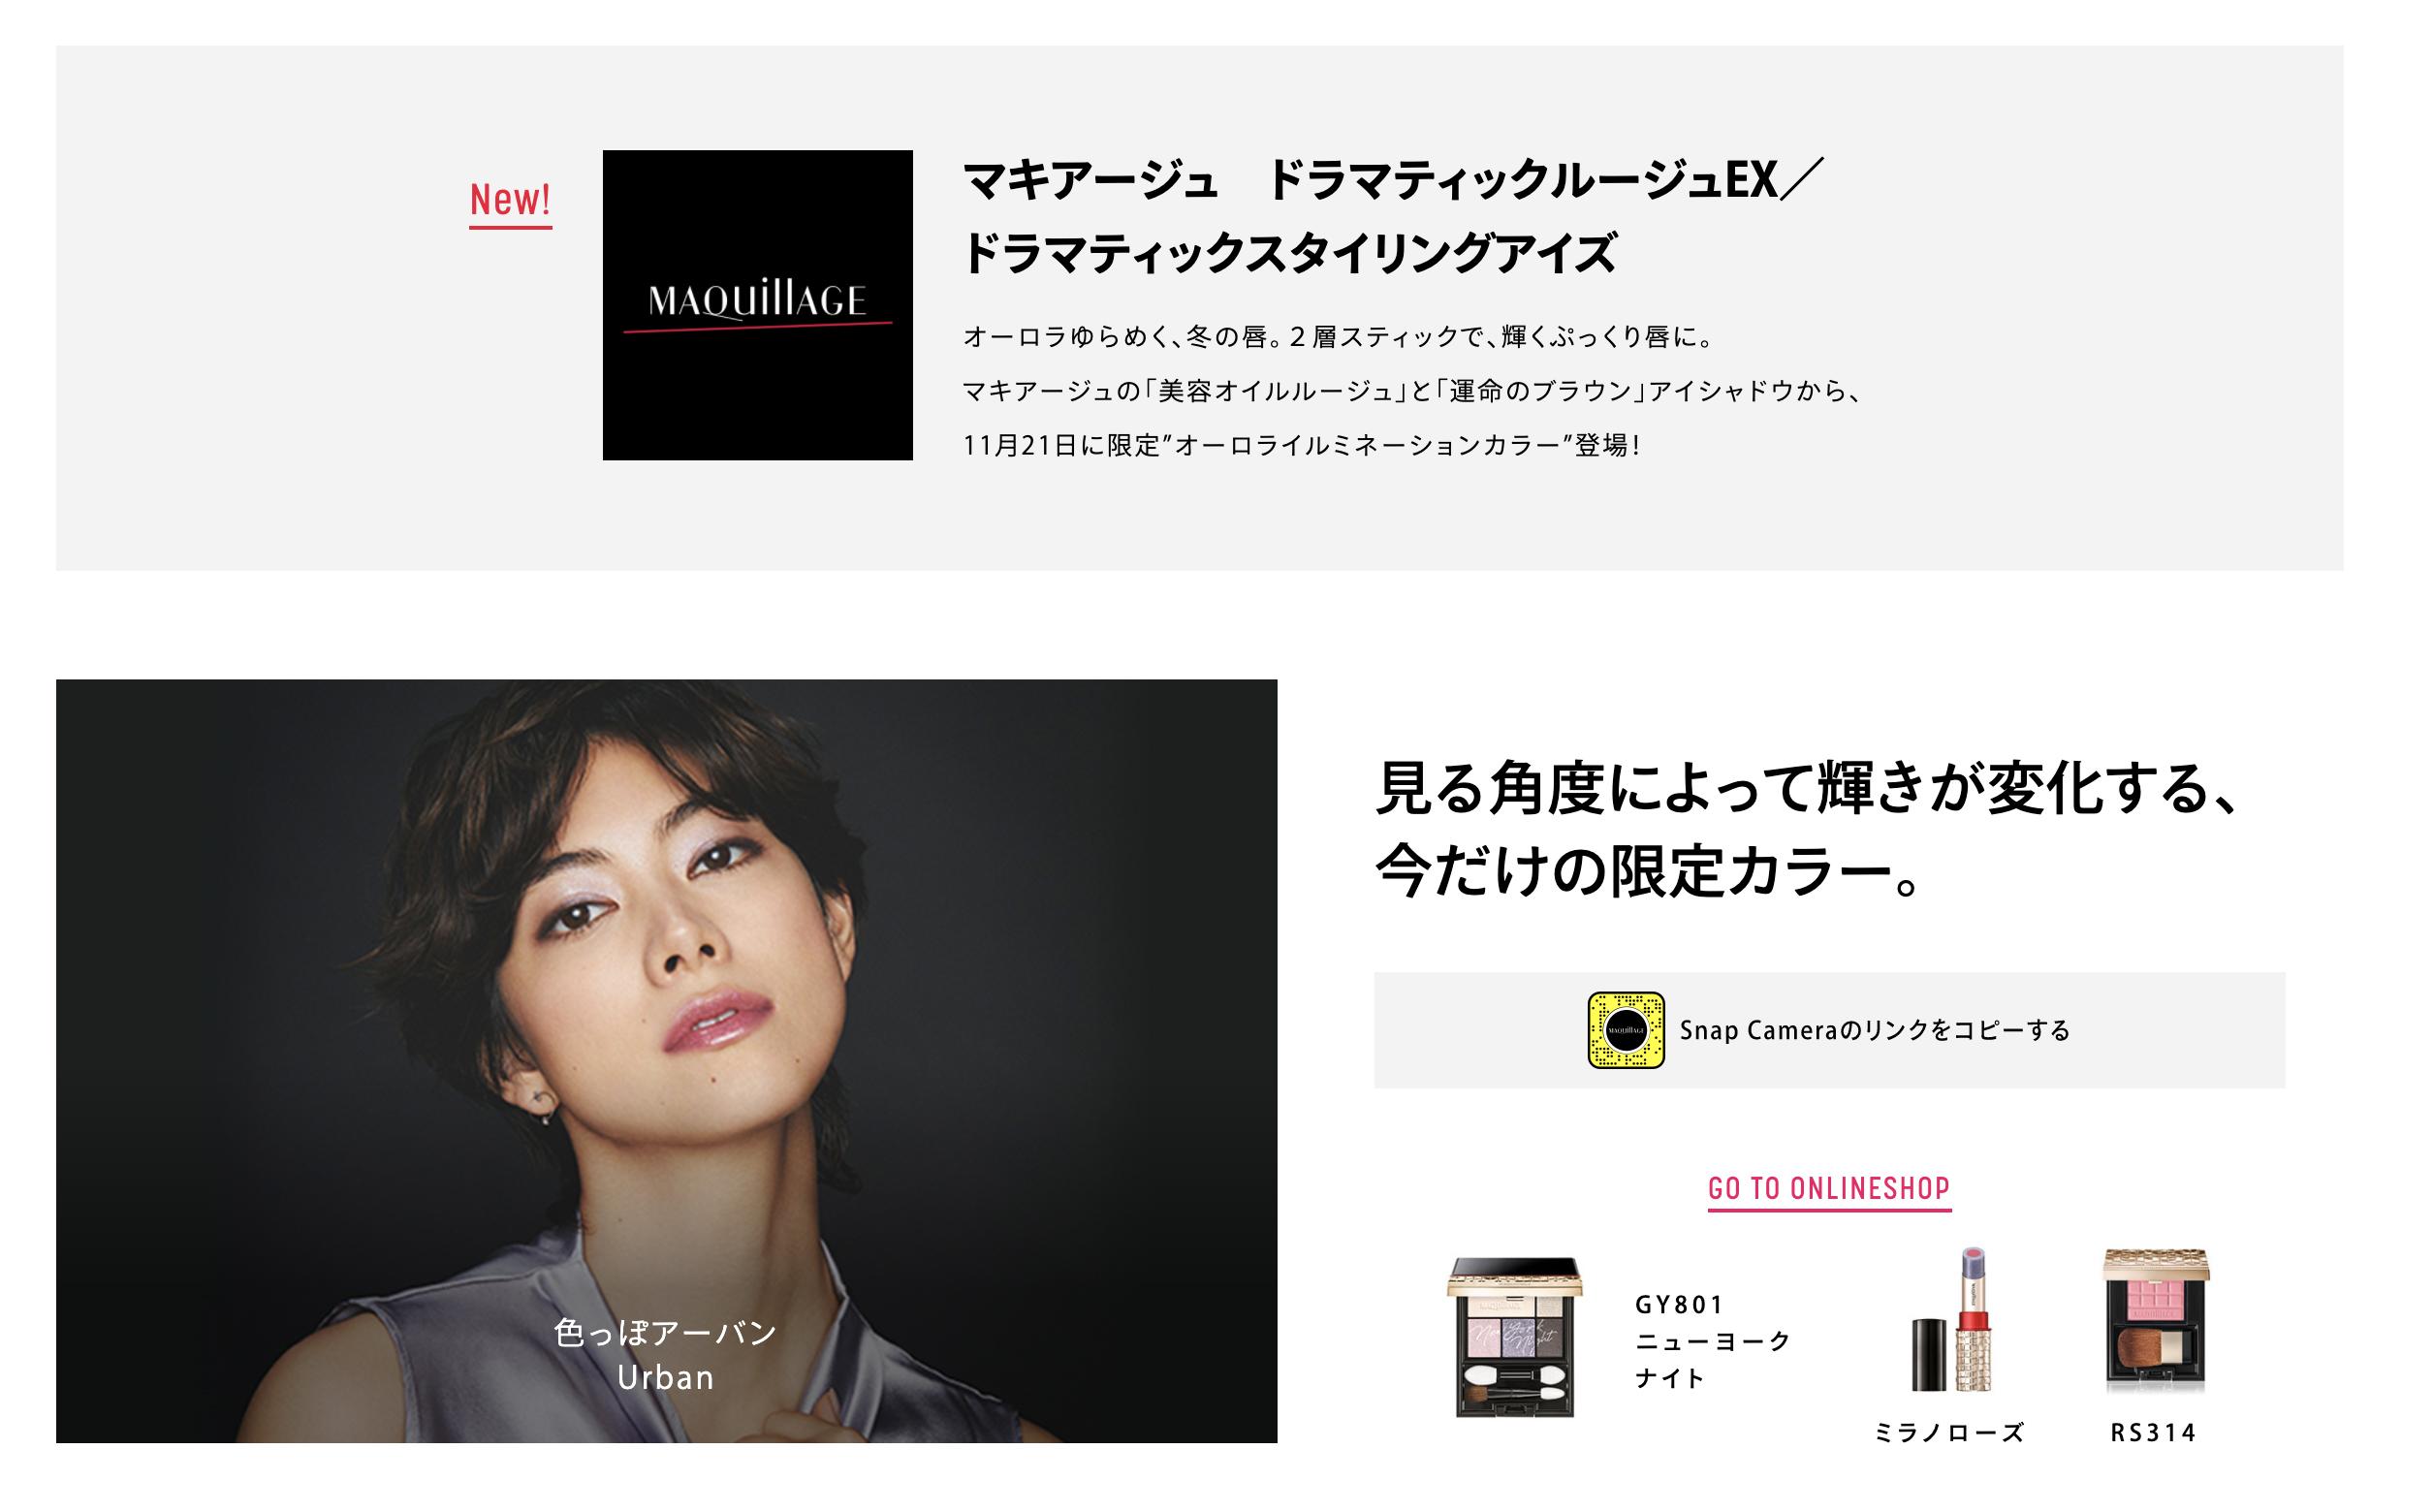 tele beautyのサイトからURLコピー